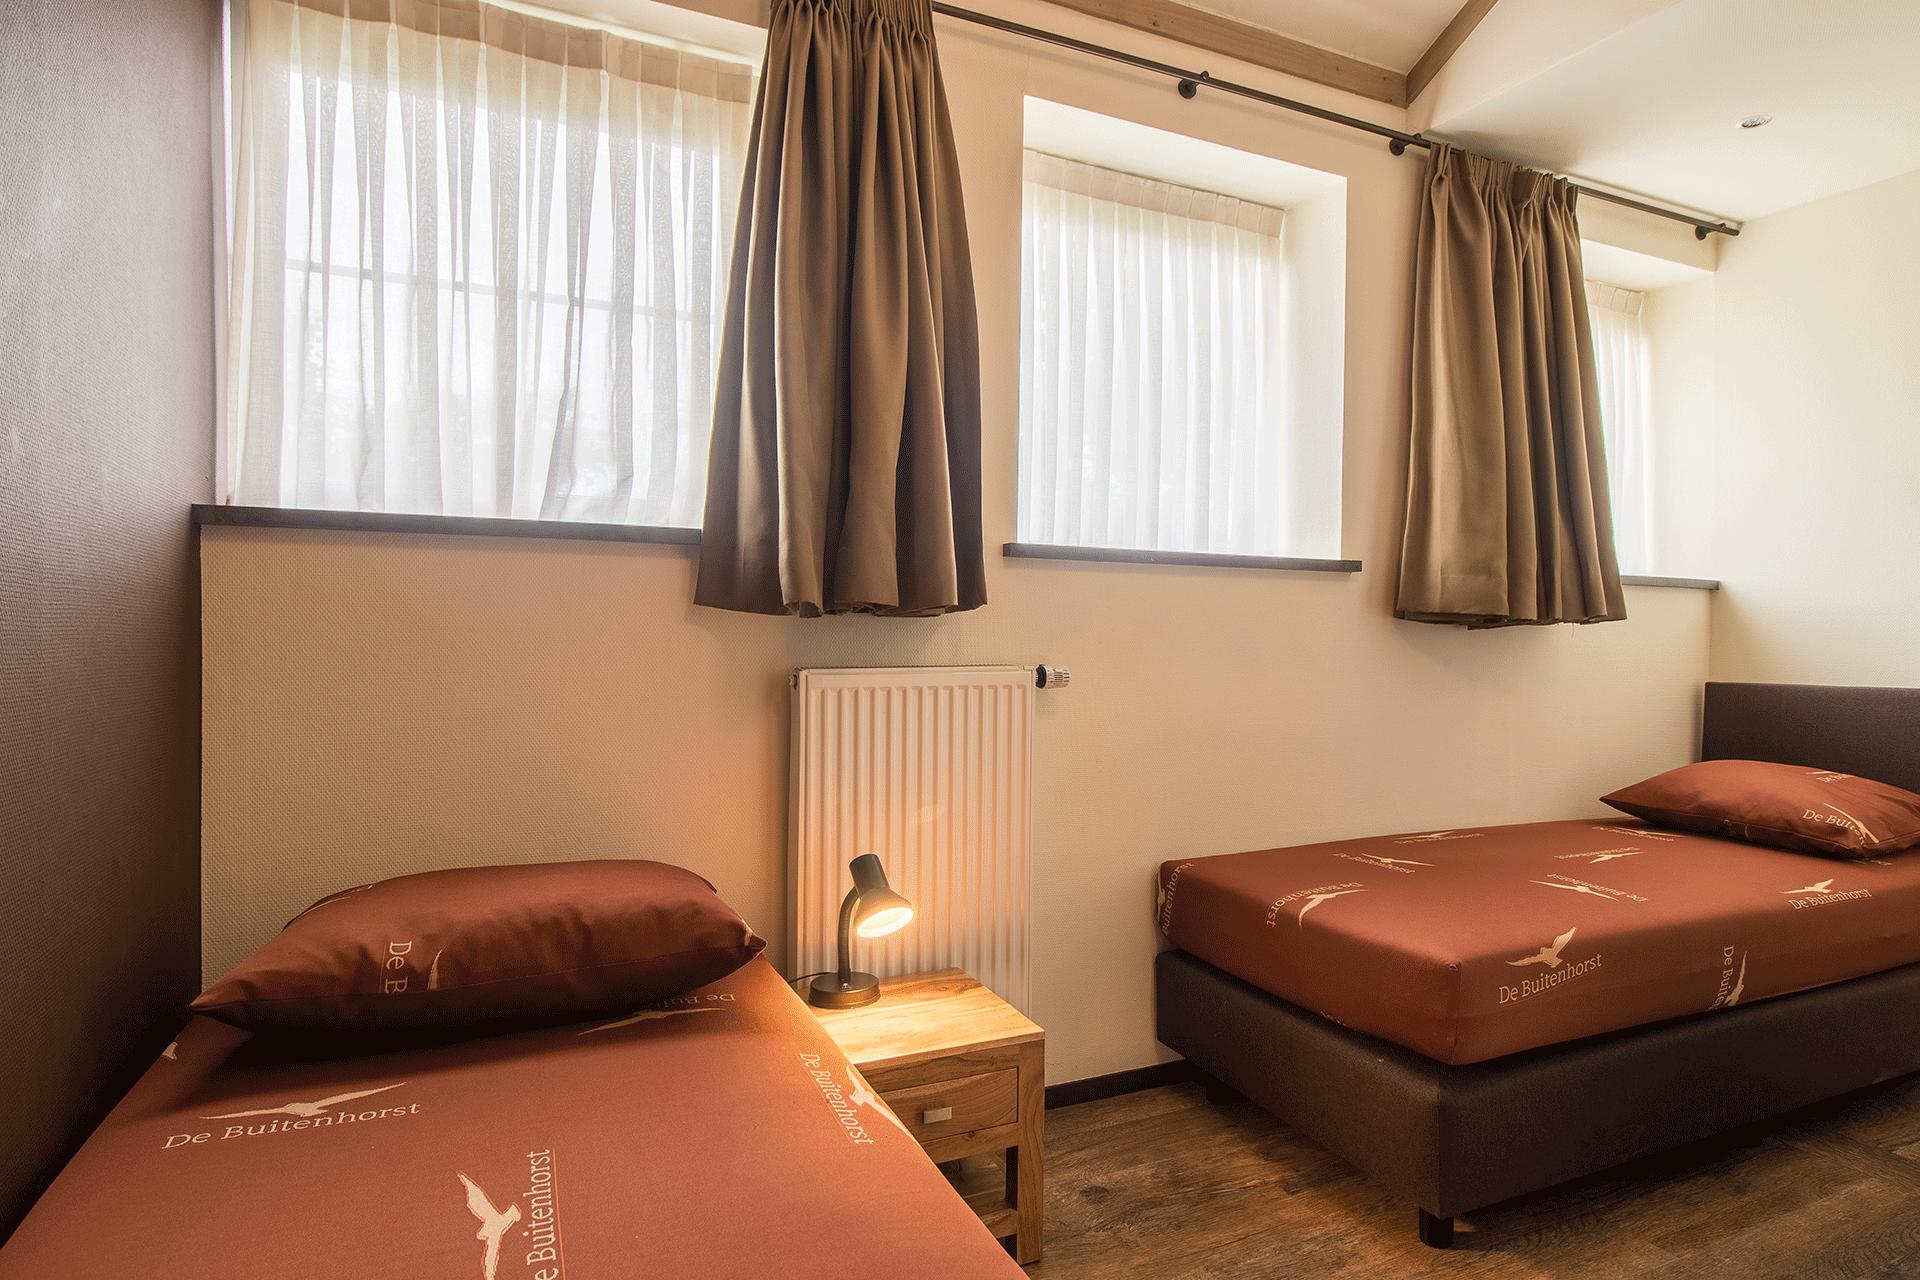 Slaapkamer-1-Ouwe-Stal